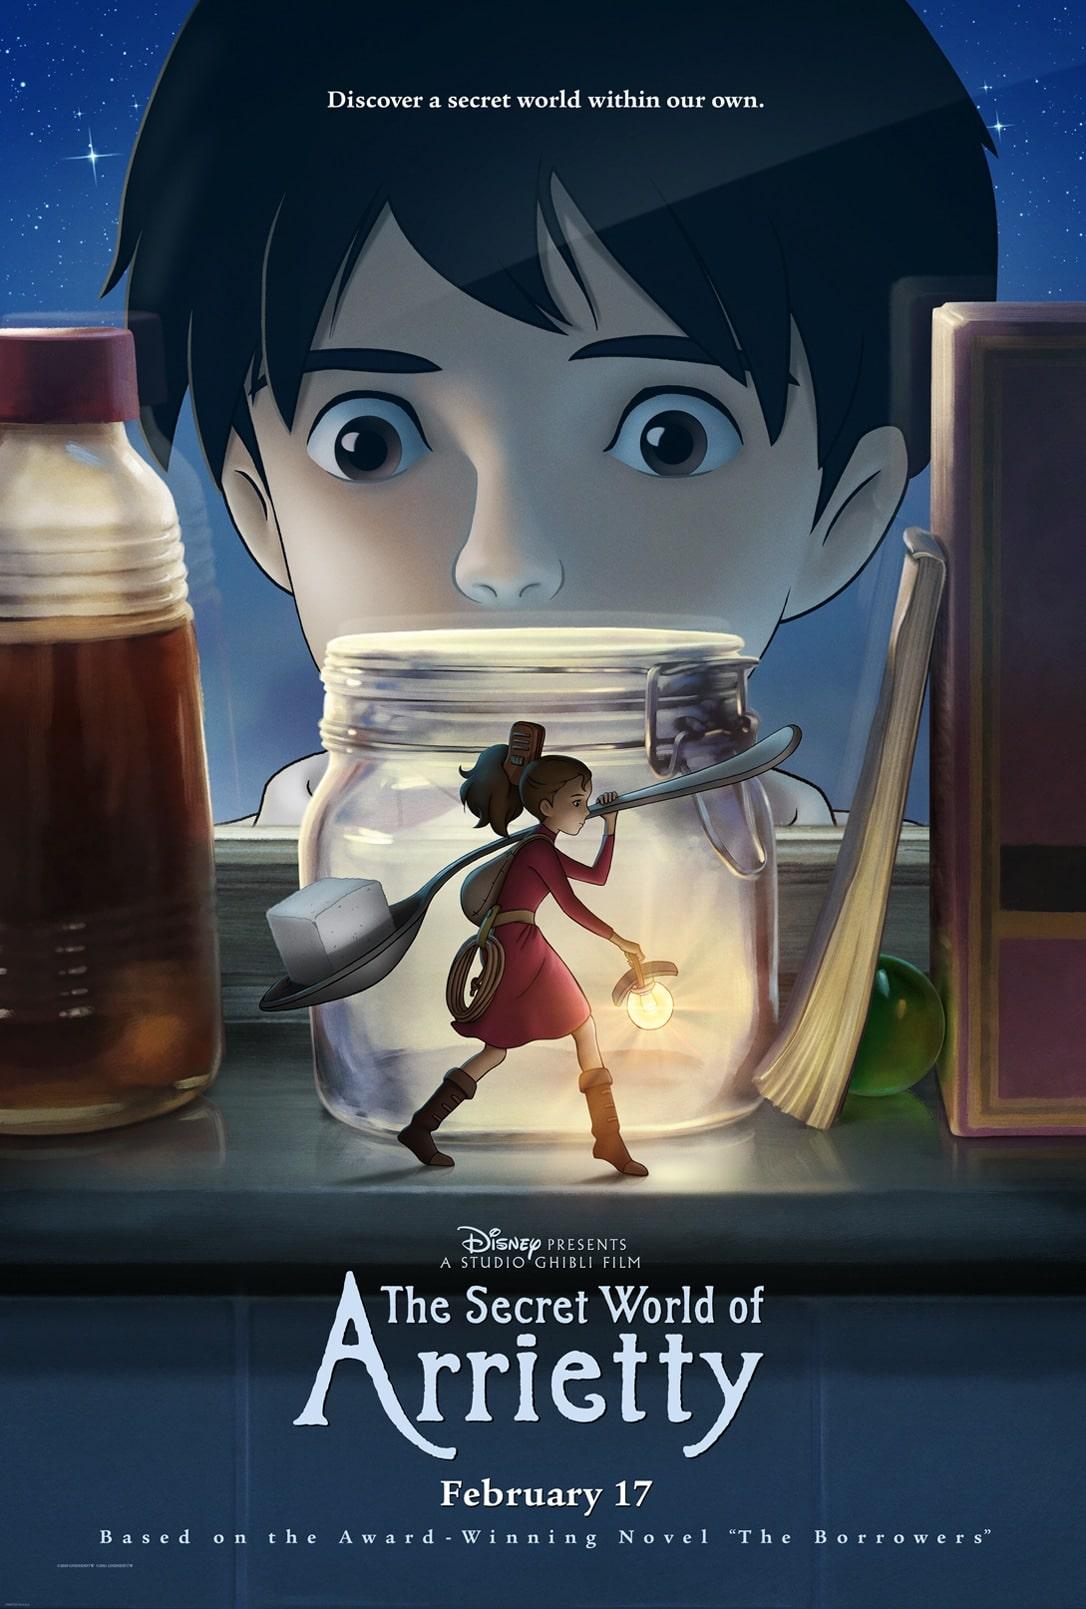 http://www.savethecat.com/wp-content/uploads/2012/04/the-secret-world-of-arrietty-poster.jpg